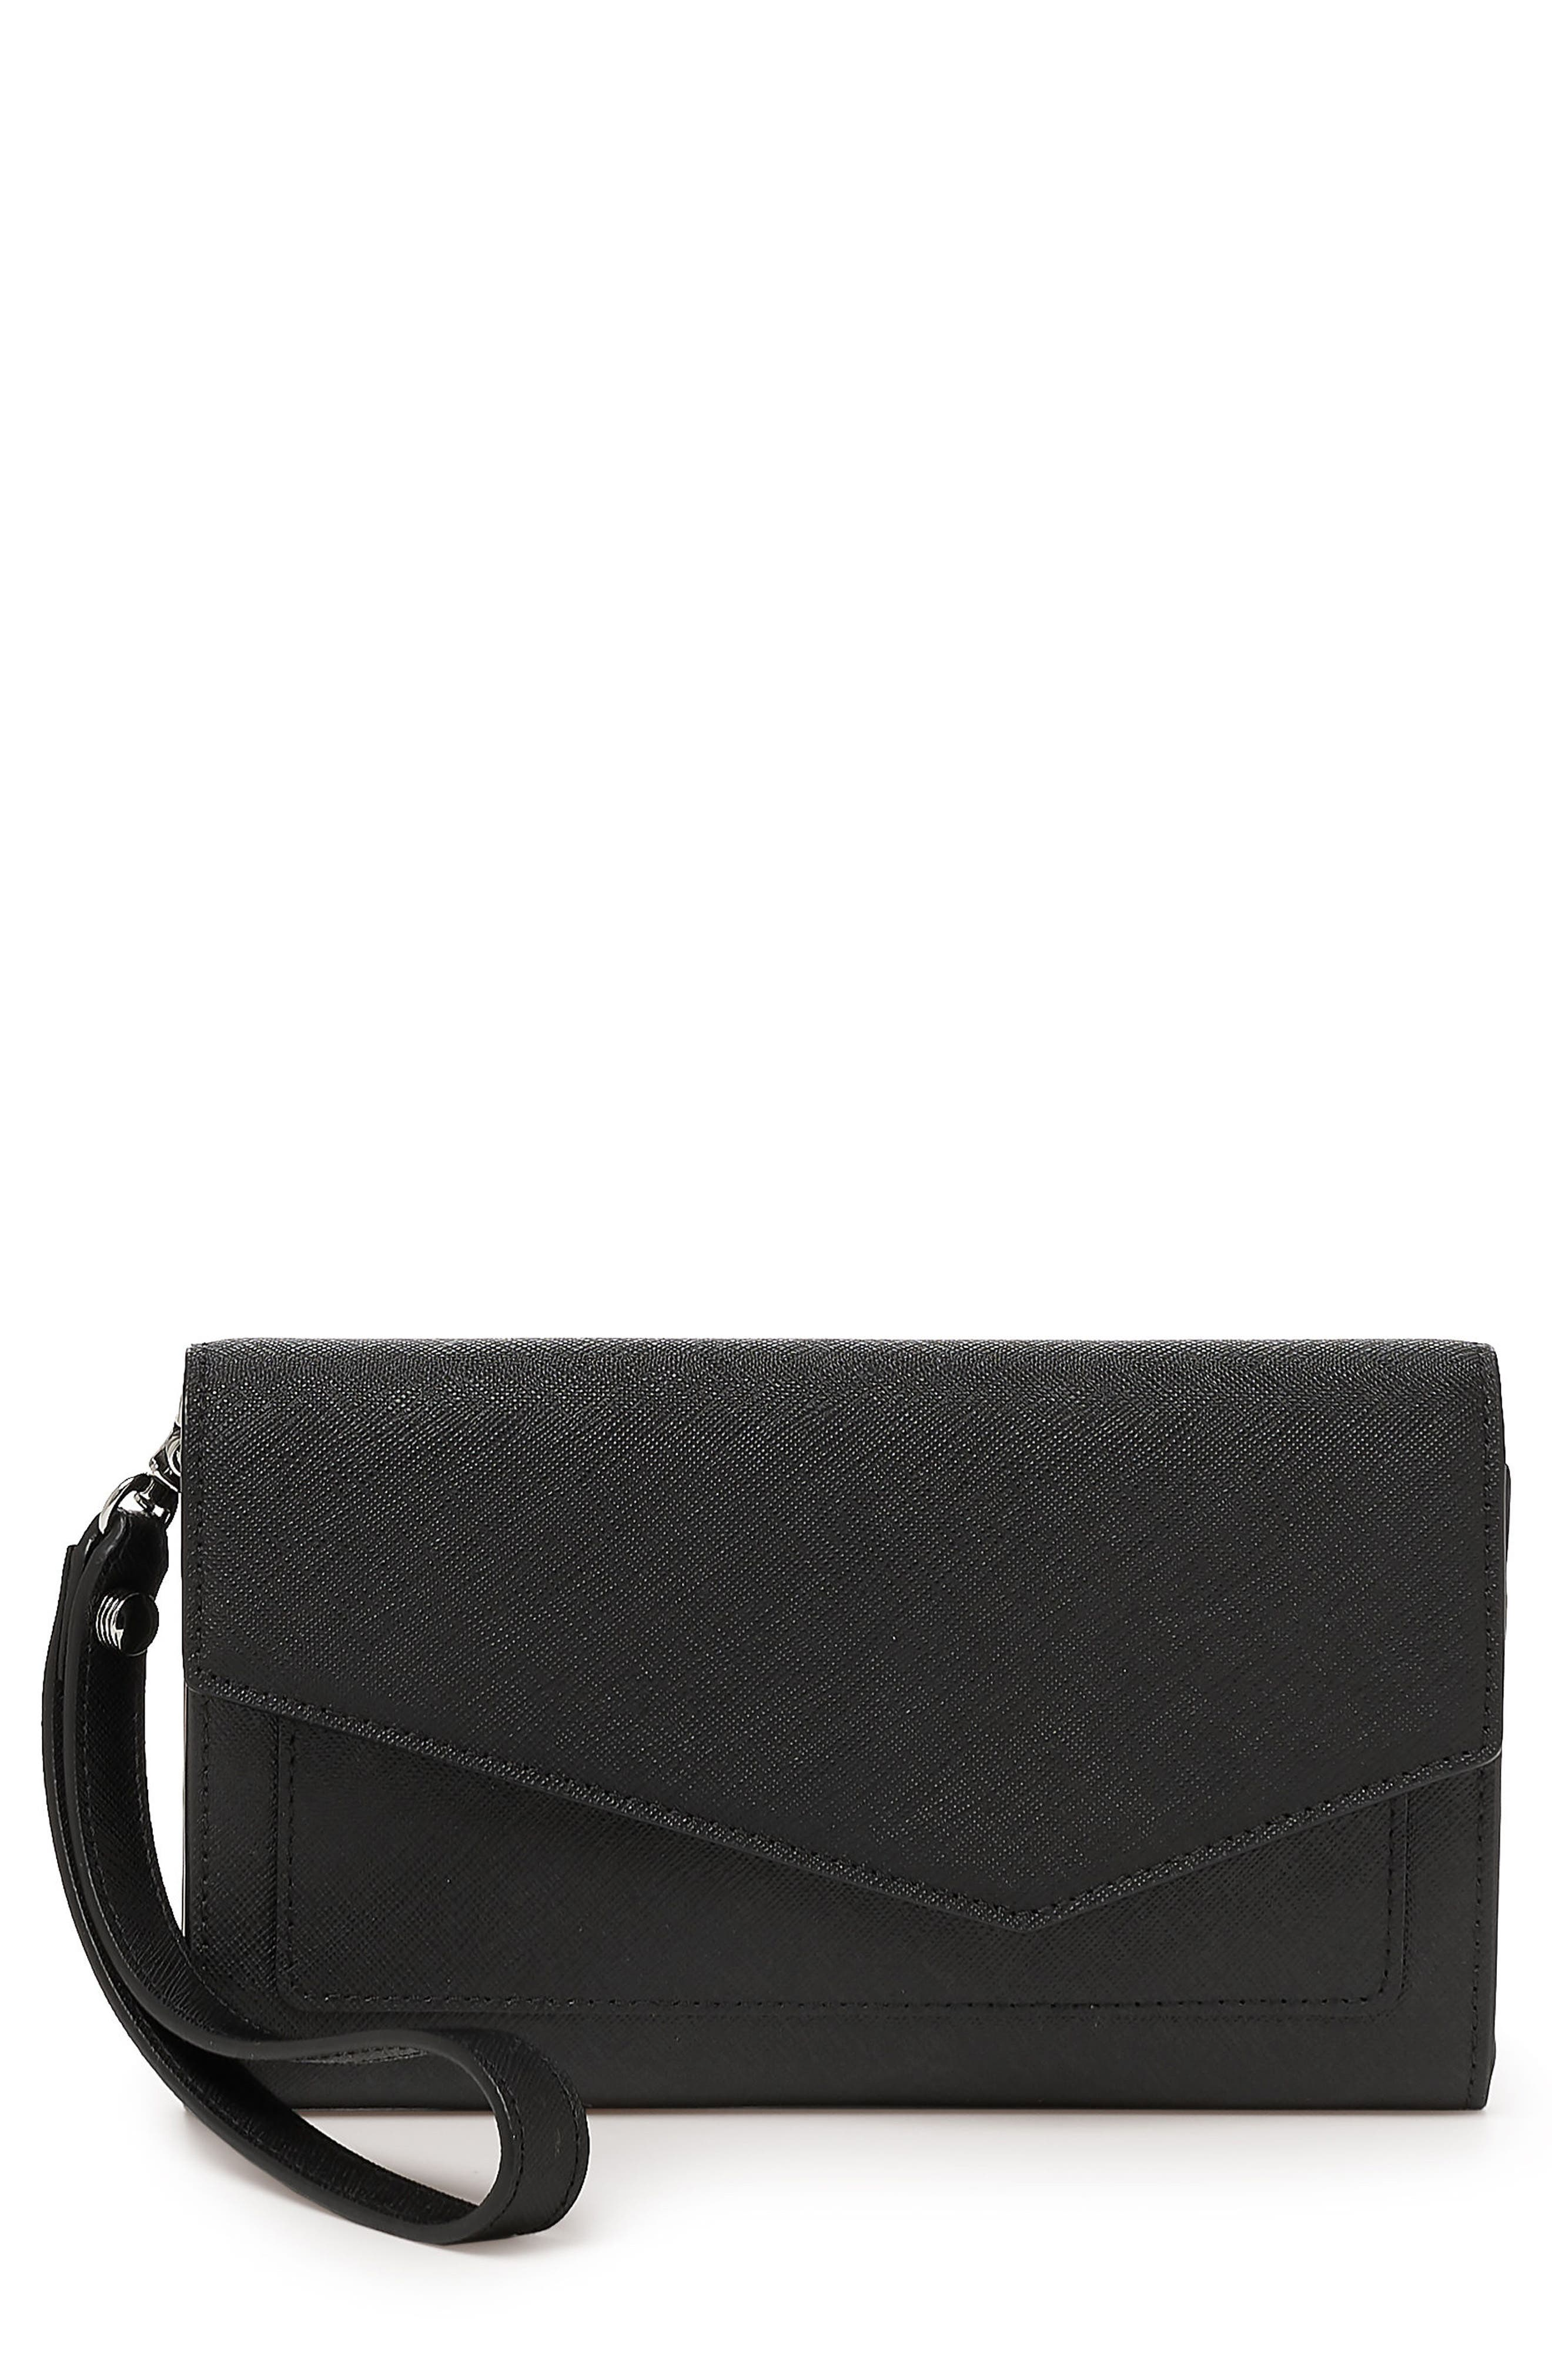 Cobble Hill Calfskin Leather Wallet,                         Main,                         color, Black